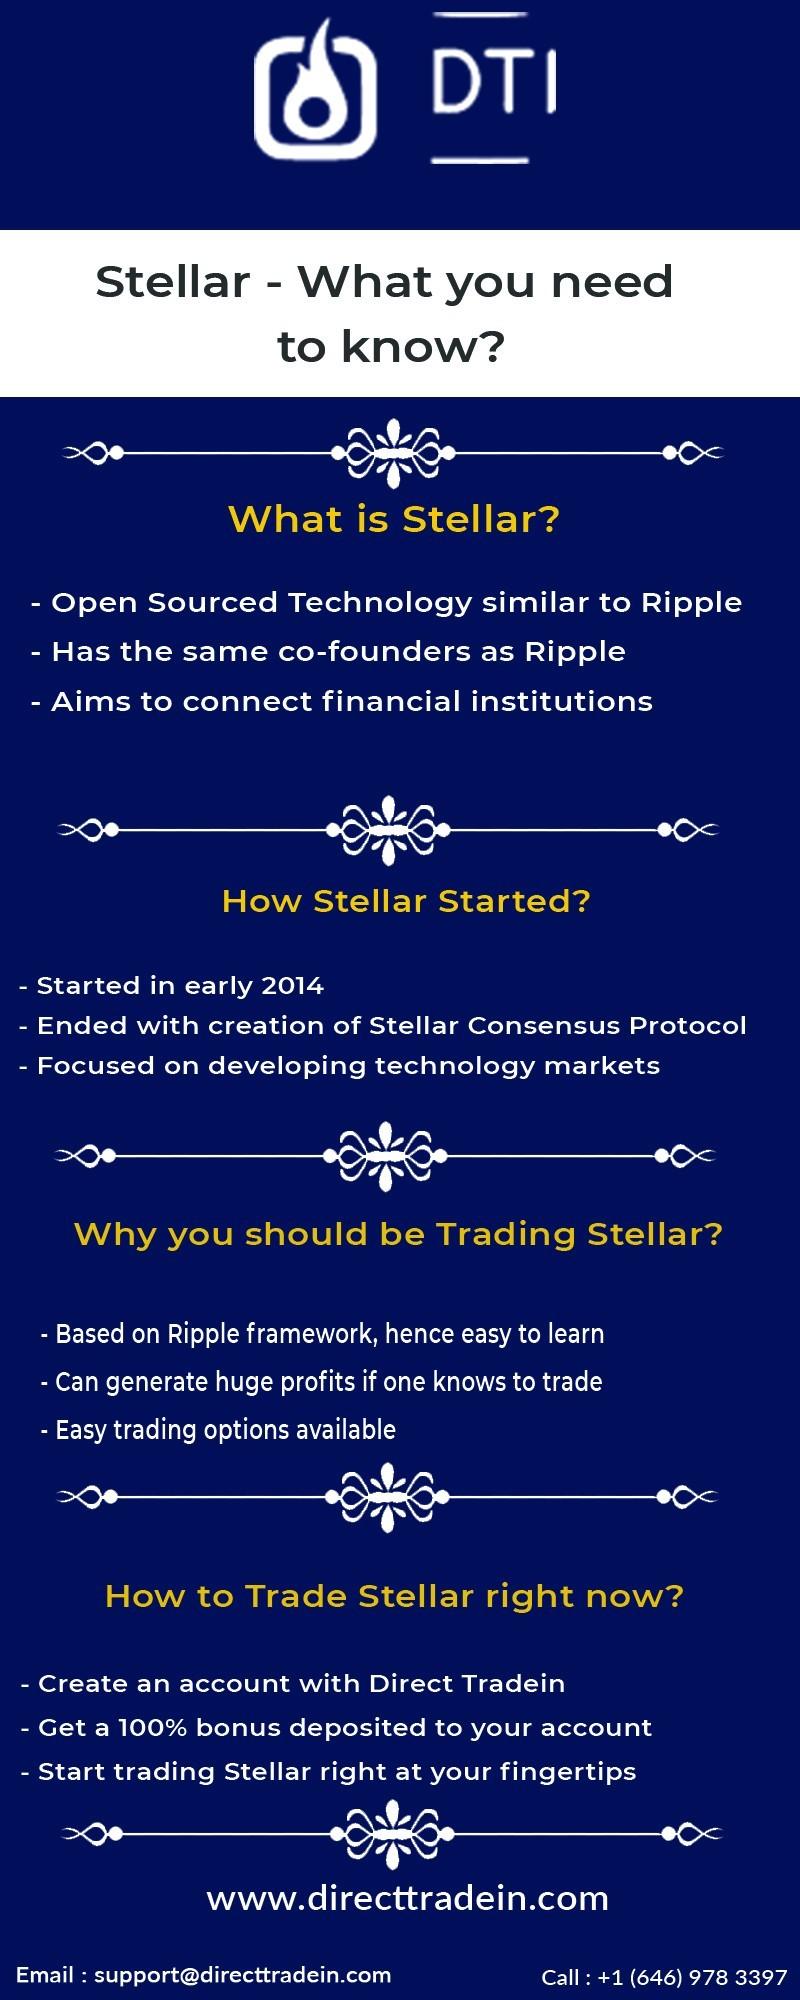 Get the Leading Stellar Trading Platform | Direct Tradein